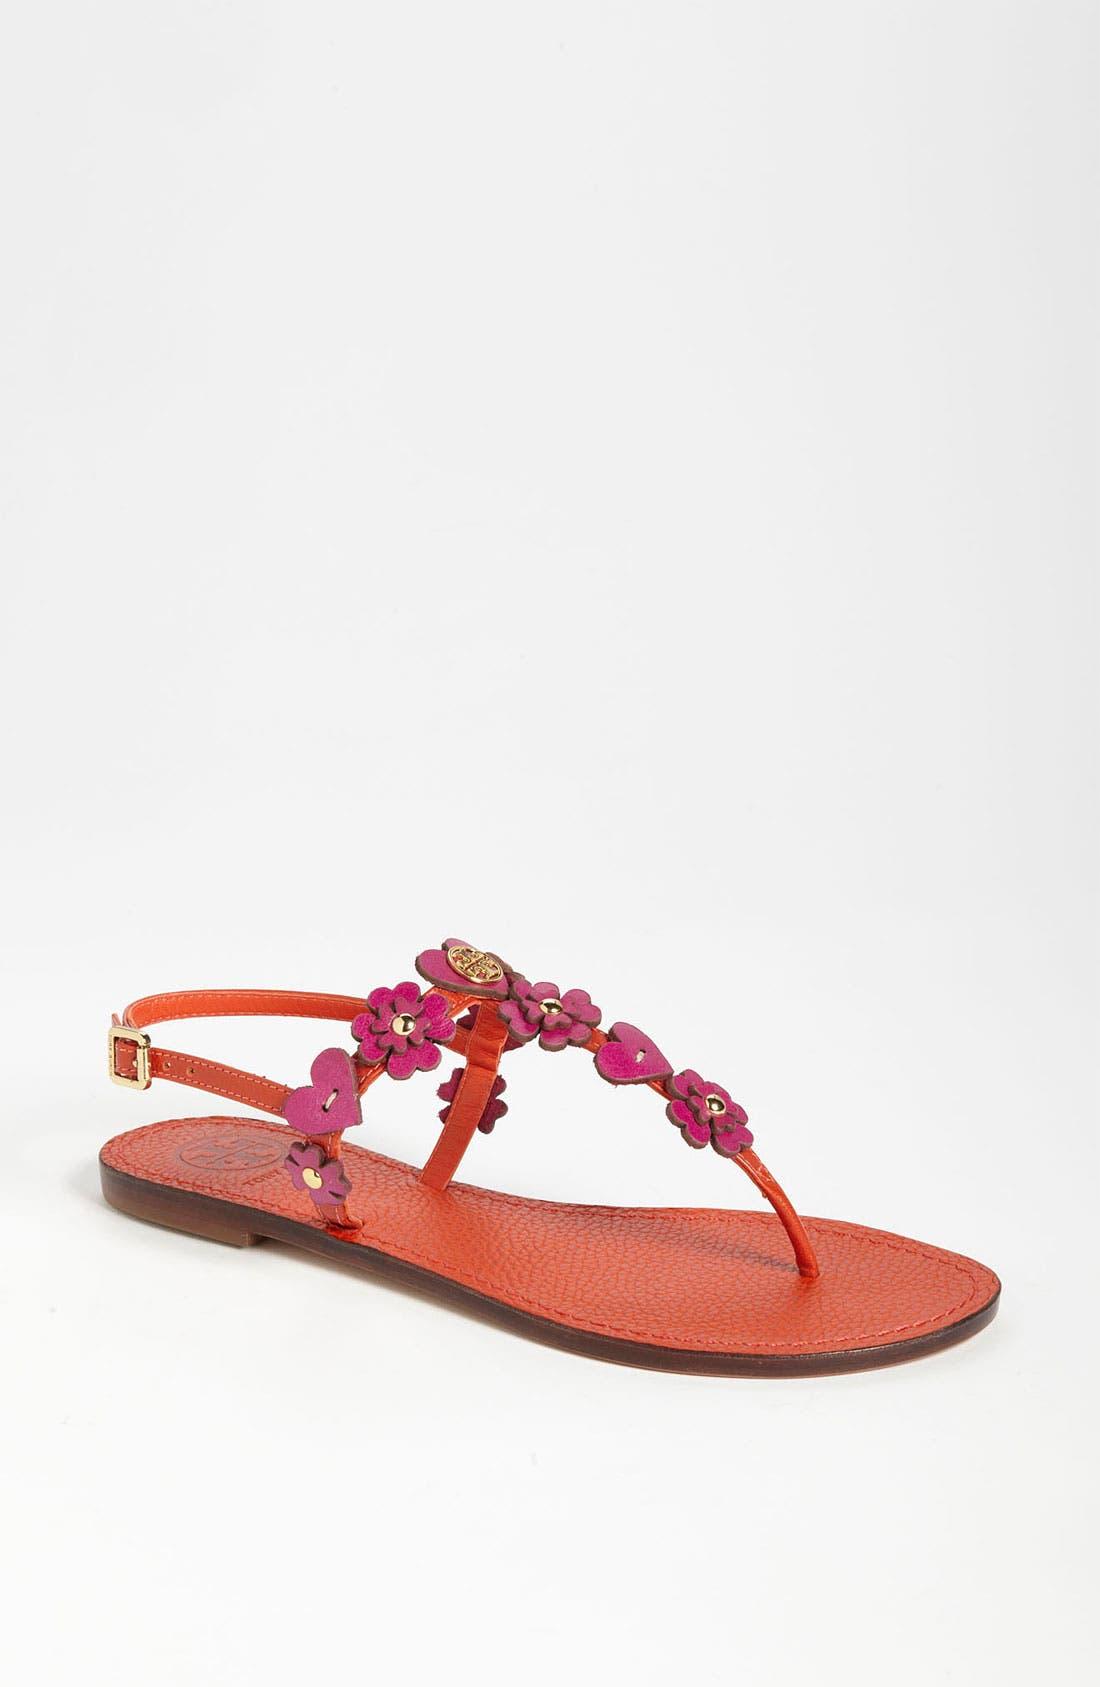 Alternate Image 1 Selected - Tory Burch 'Cori' Thong Sandal